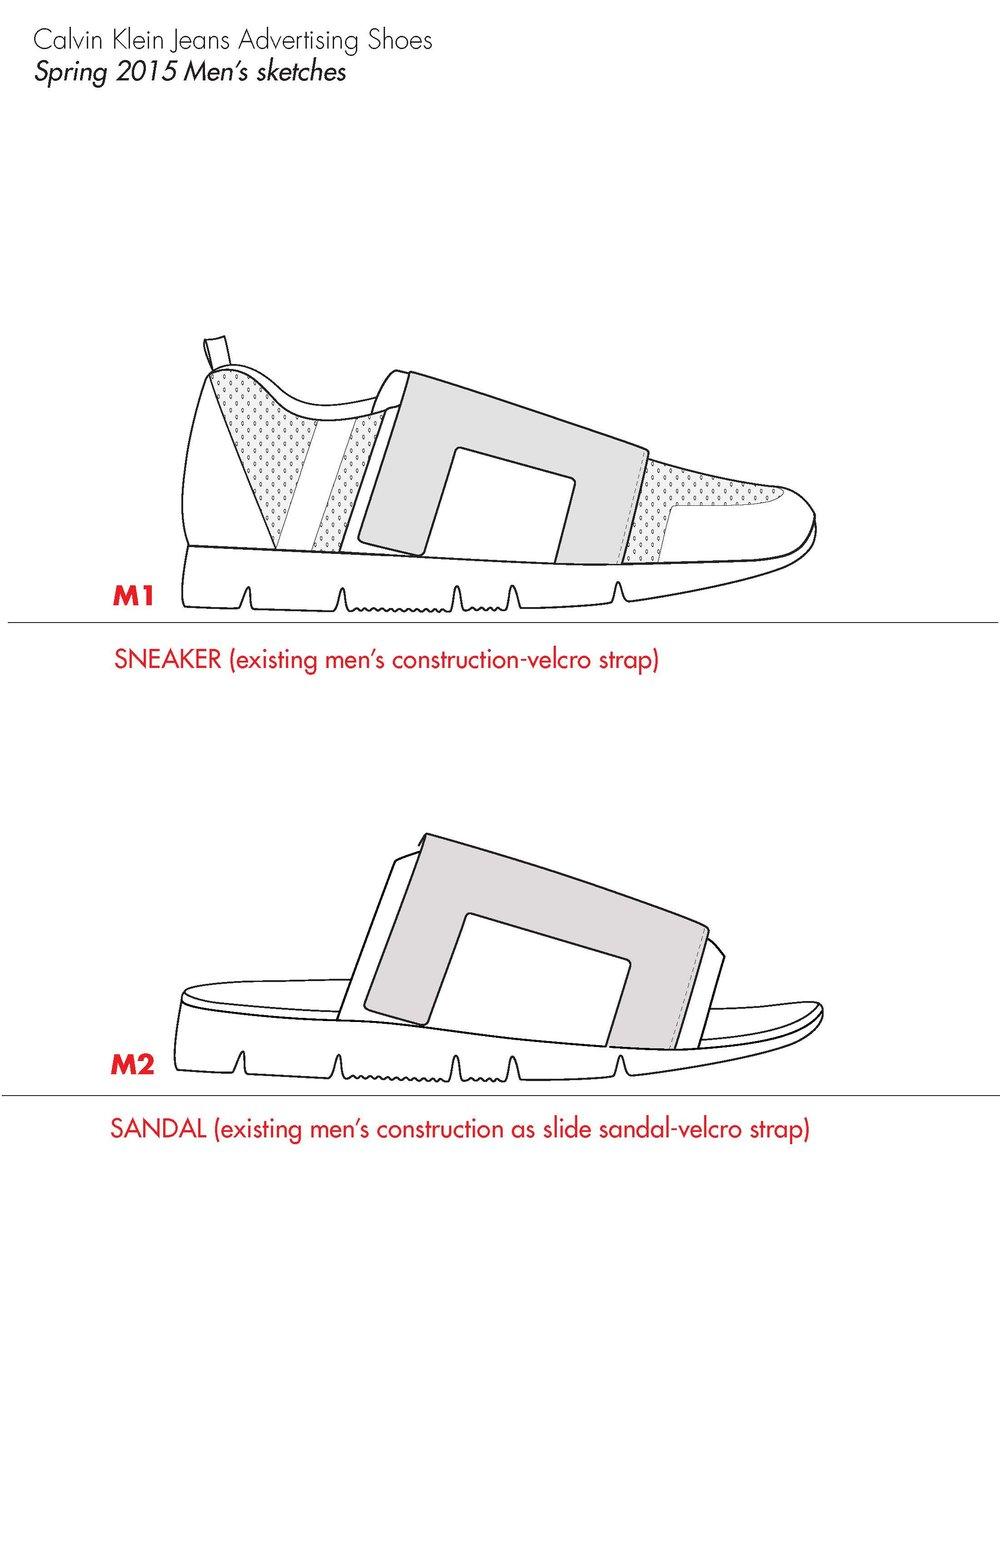 6.KGRESS Portfolio-SS15 CKJ AD Footwear_Page_03.jpg